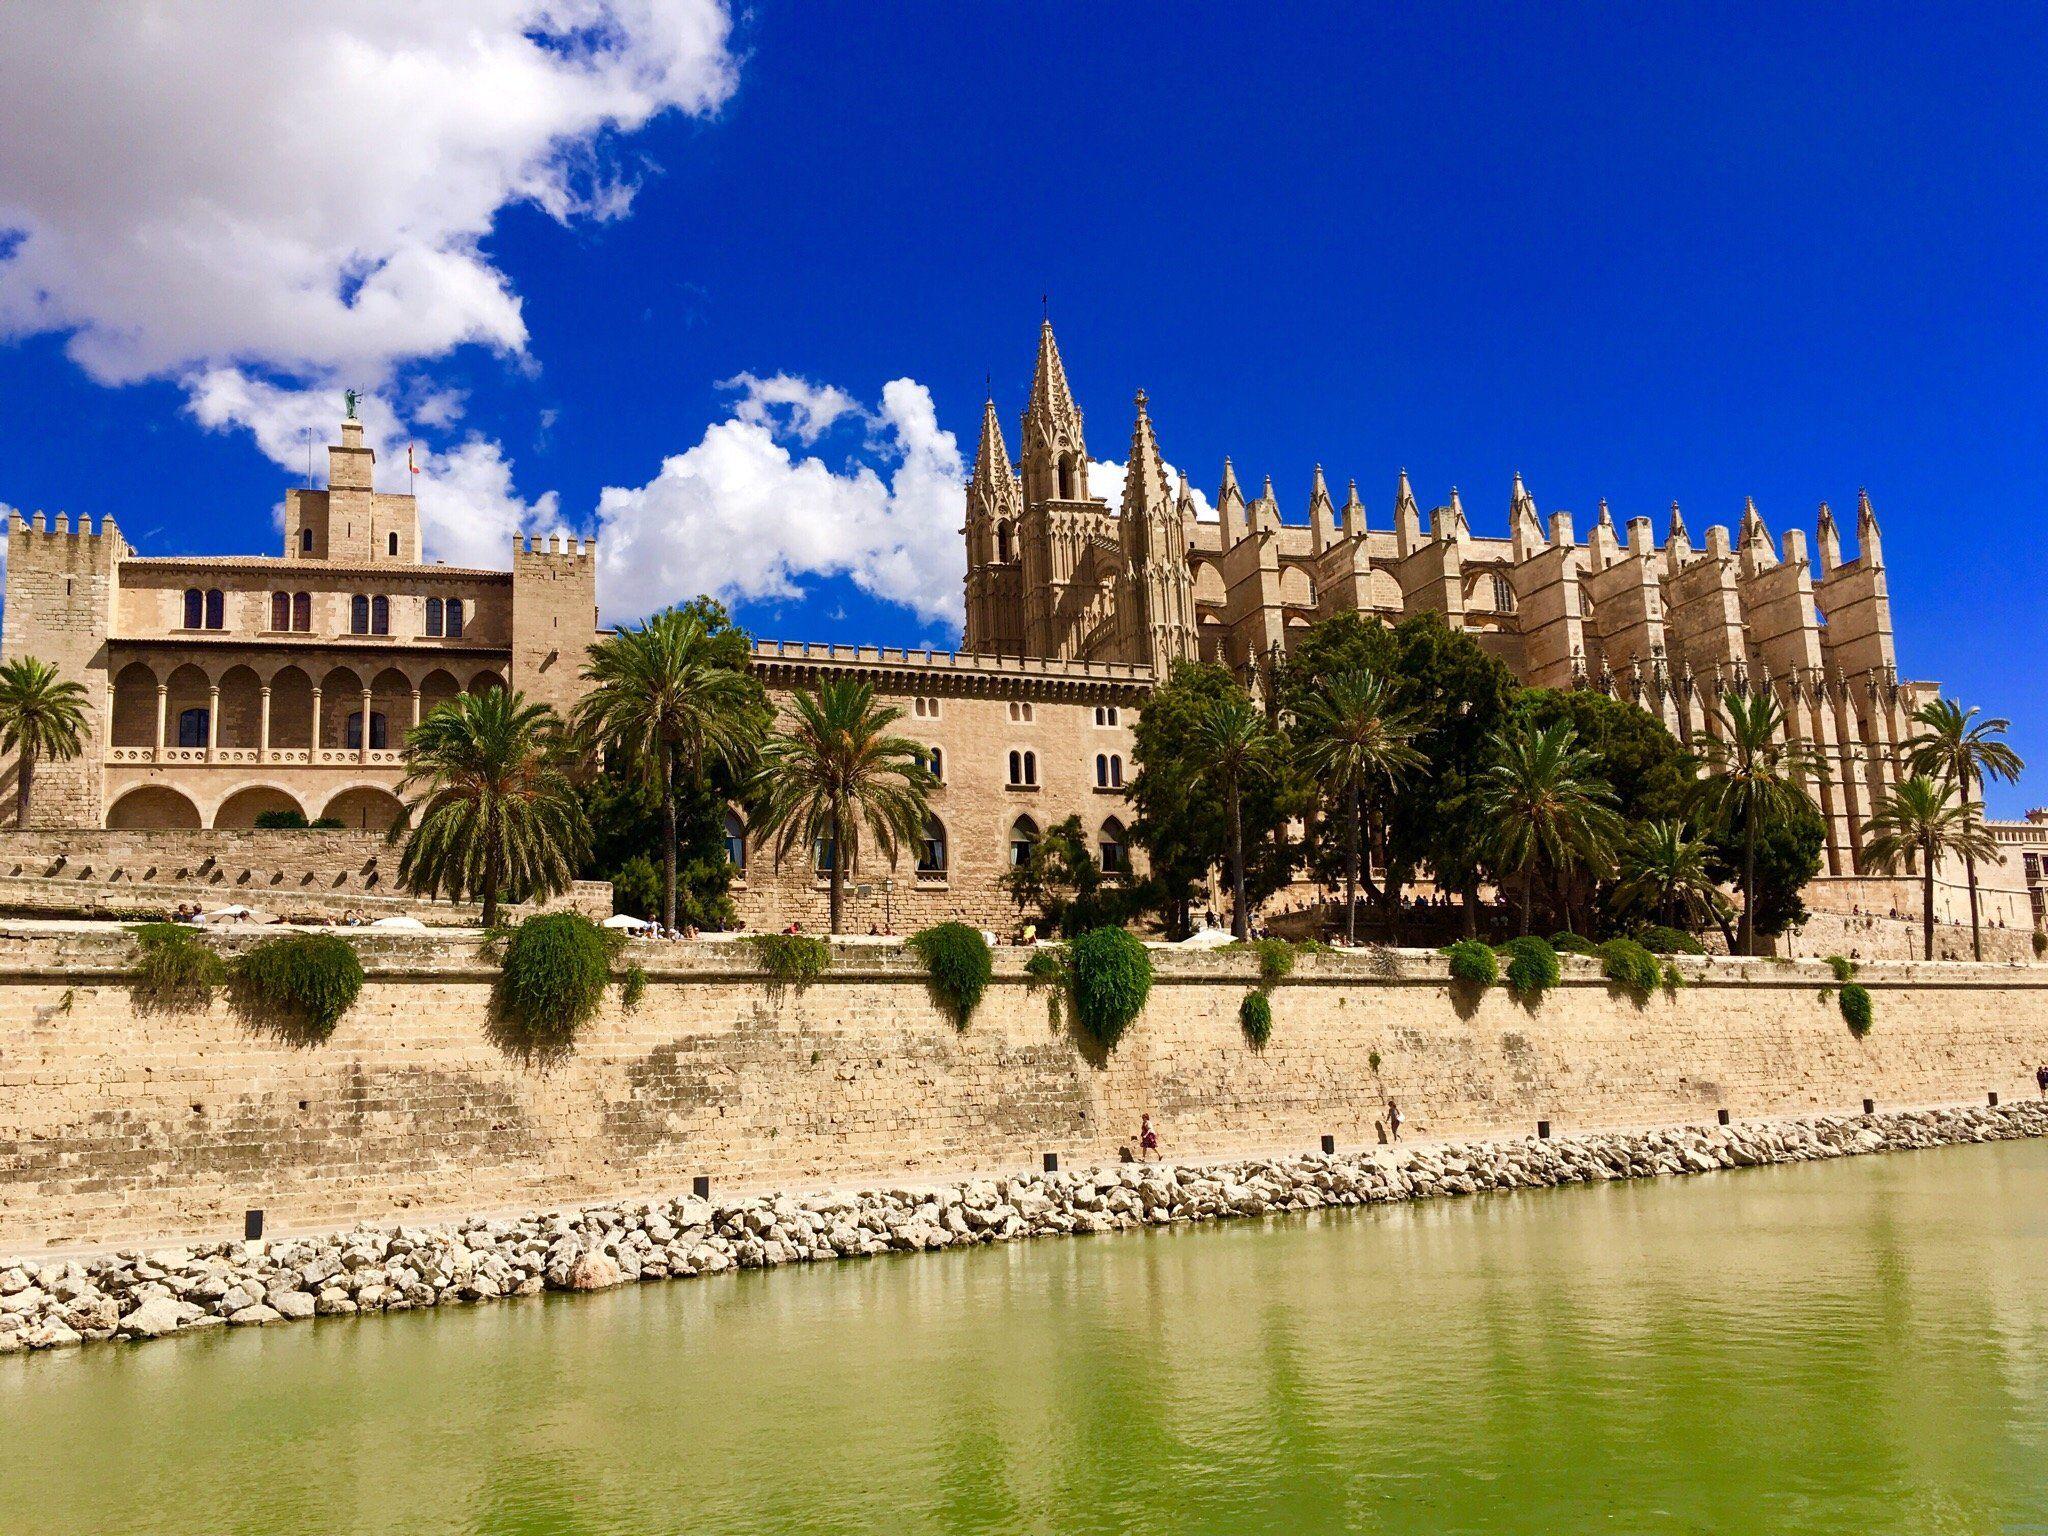 Catedral De Mallorca Palma De Mallorca 2020 Alles Wat U Moet Weten Voordat U Vertrekt Met Foto S Palma De Mallorca Coastal Cities Beautiful Architecture